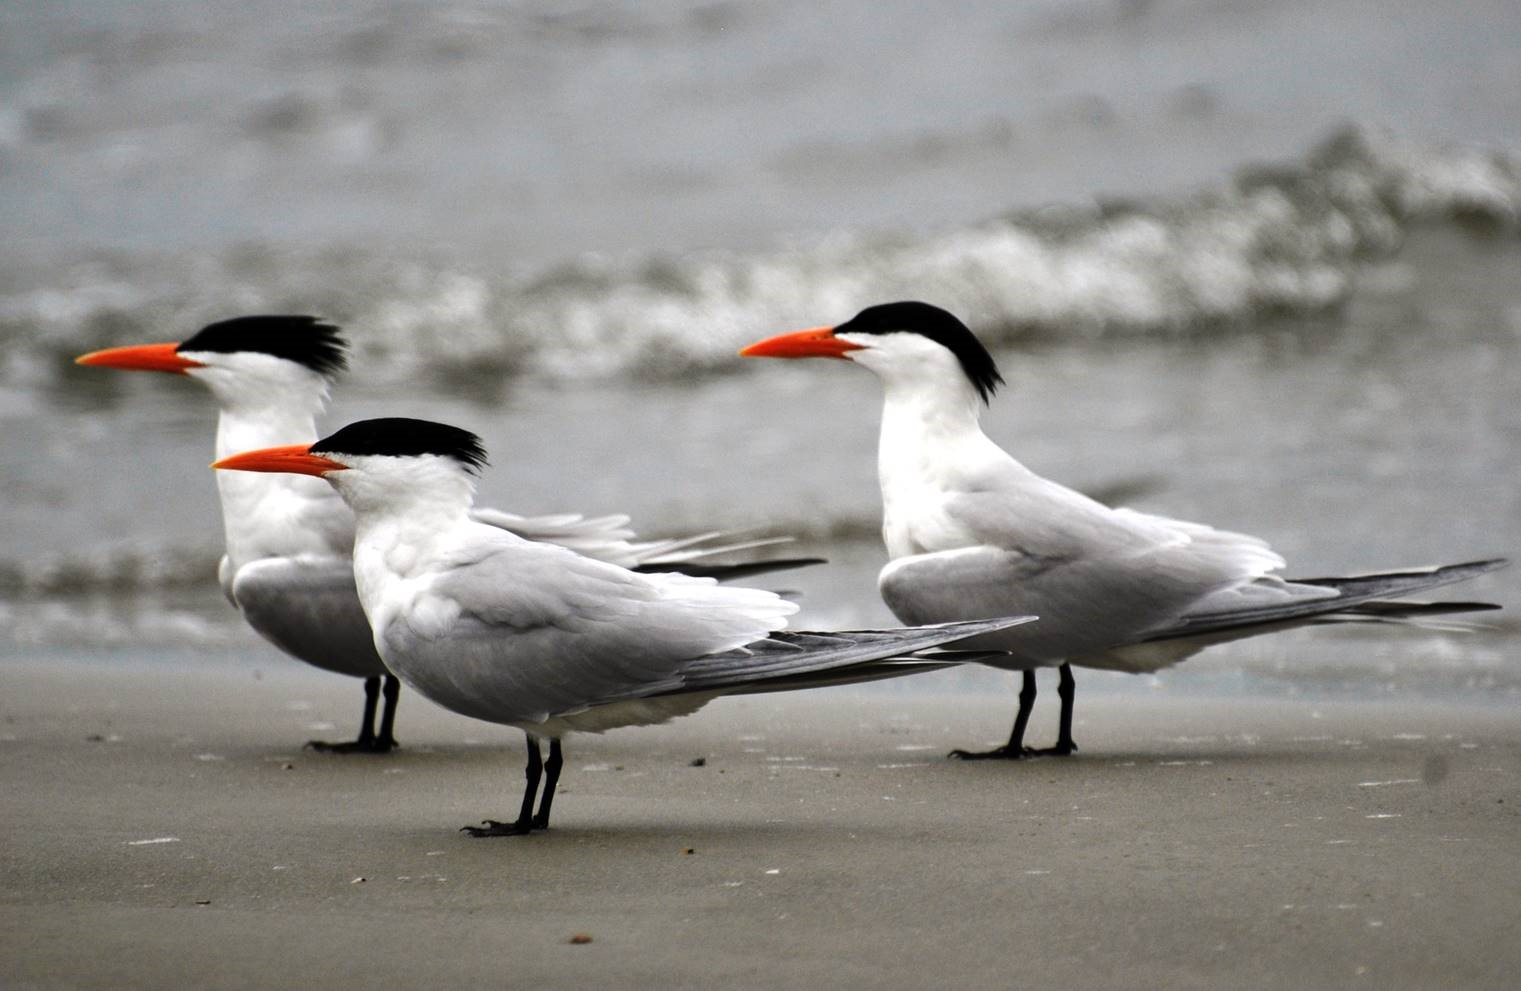 sea gulls with hats.jpg